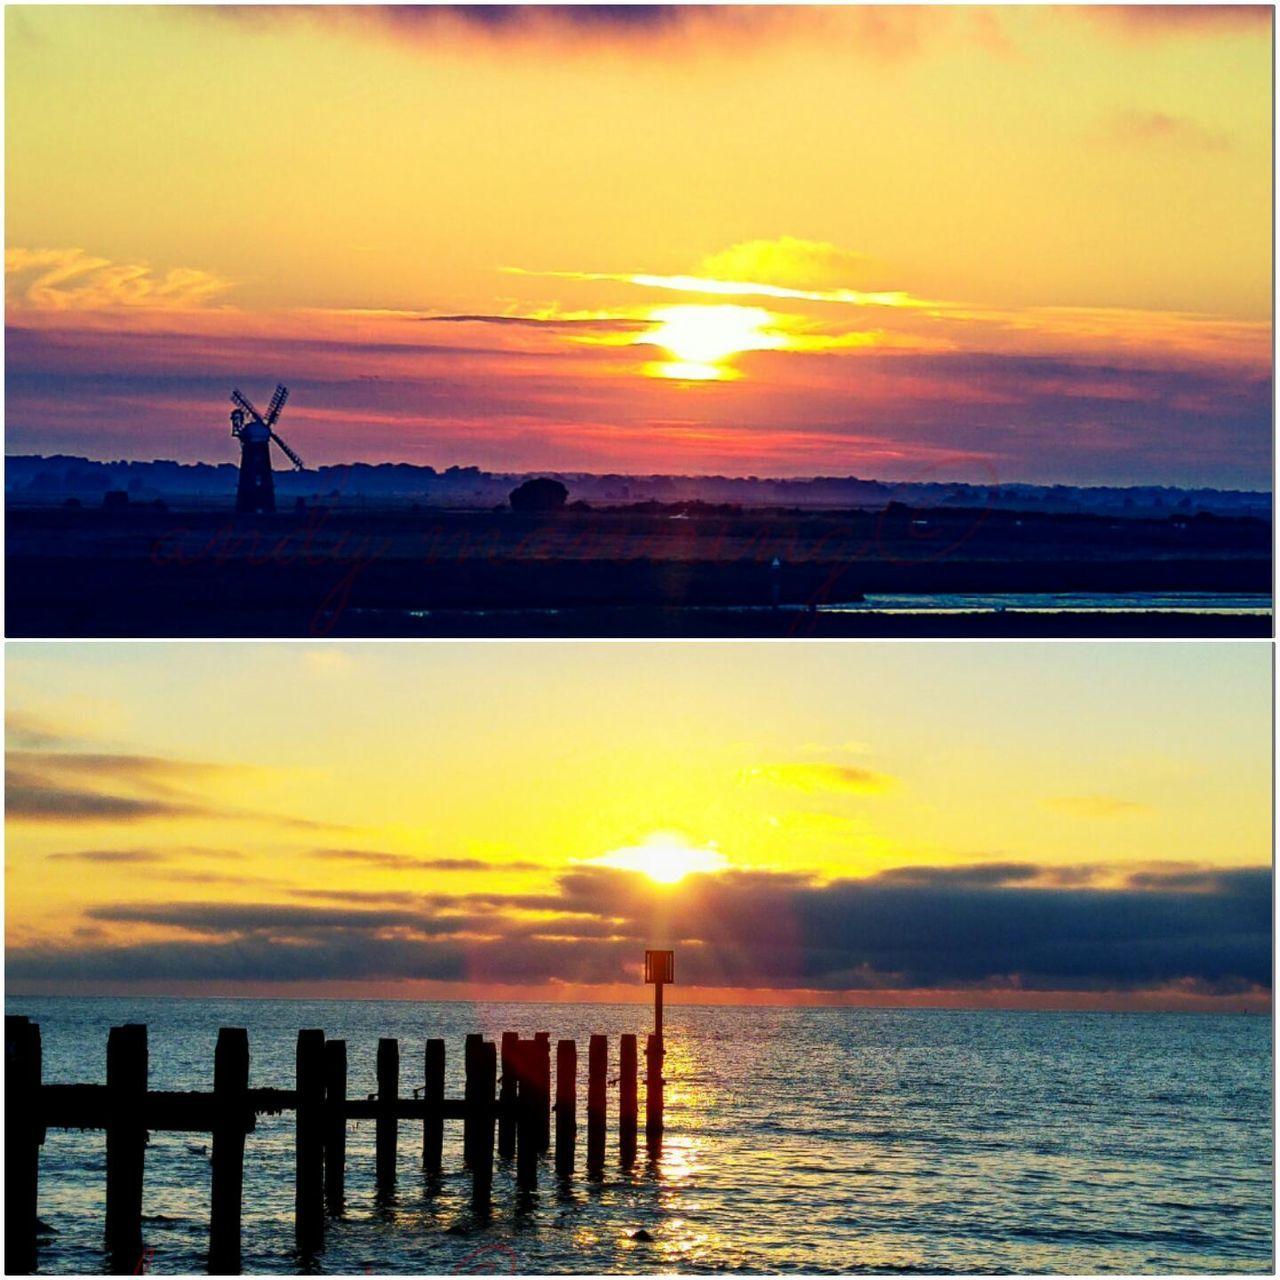 Sunset 22/7/16, sunrise 23/7/16. Taking Photos Check This Out Sunsetporn Sunset #sun #clouds #skylovers #sky #nature #beautifulinnature #naturalbeauty #photography #landscape Sunset_collection Sunrise_sunsets_aroundworld Malephotographerofthemonth The Purist (no Edit, No Filter) Natural Beauty Sun_collection, Sky_collection, Cloudporn, Skyporn Follow Me :) From My Point Of View Sunrisephotography Beach Photography Beachphotography Sunrise_Collection Lowestoft Followme Sunshine